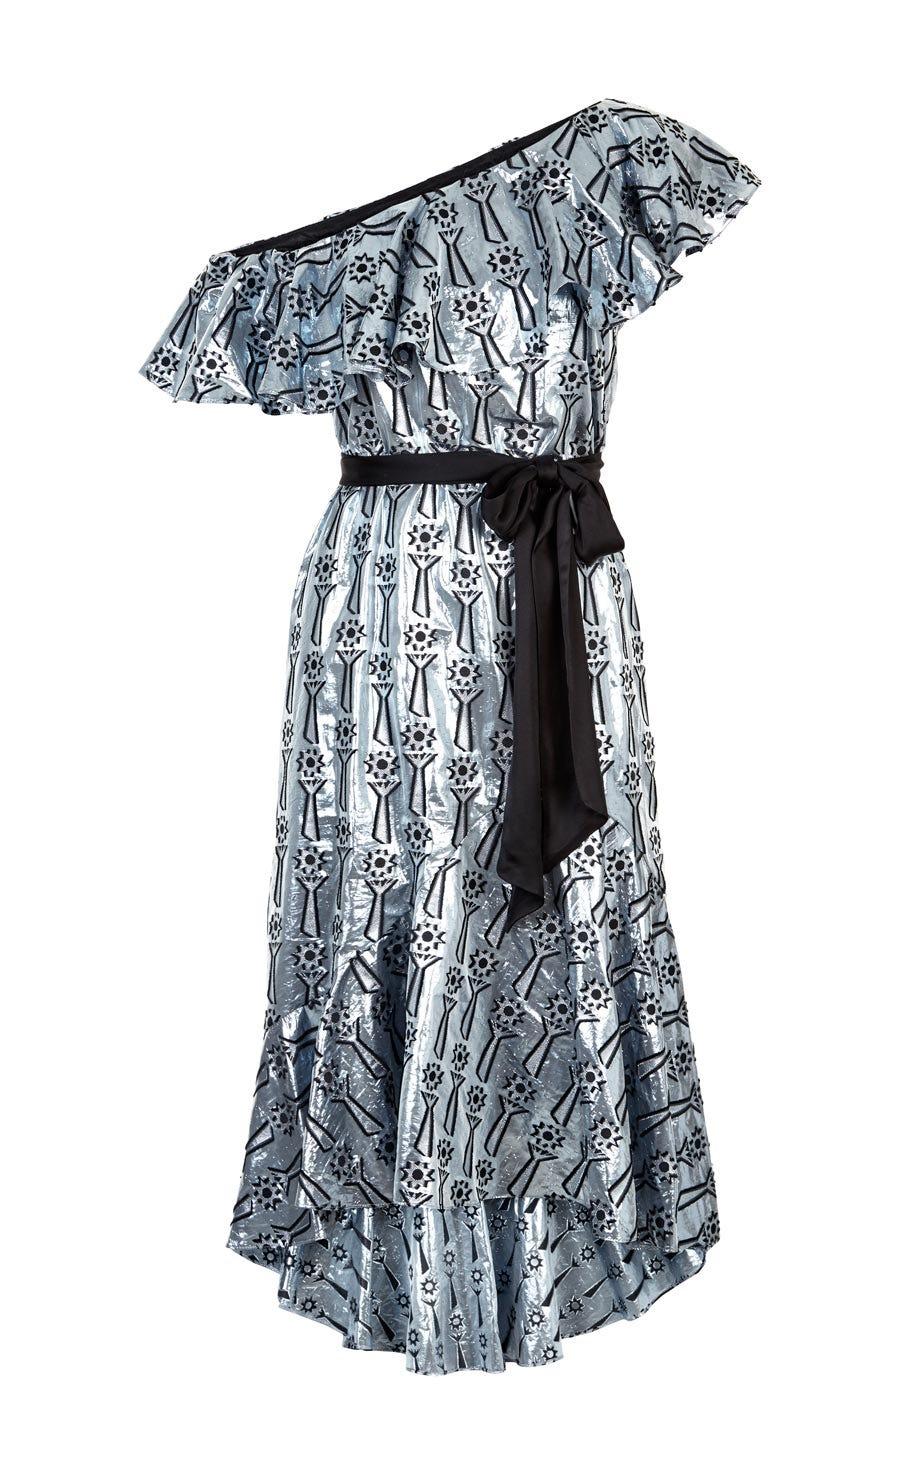 Eliska Ruffle Dress